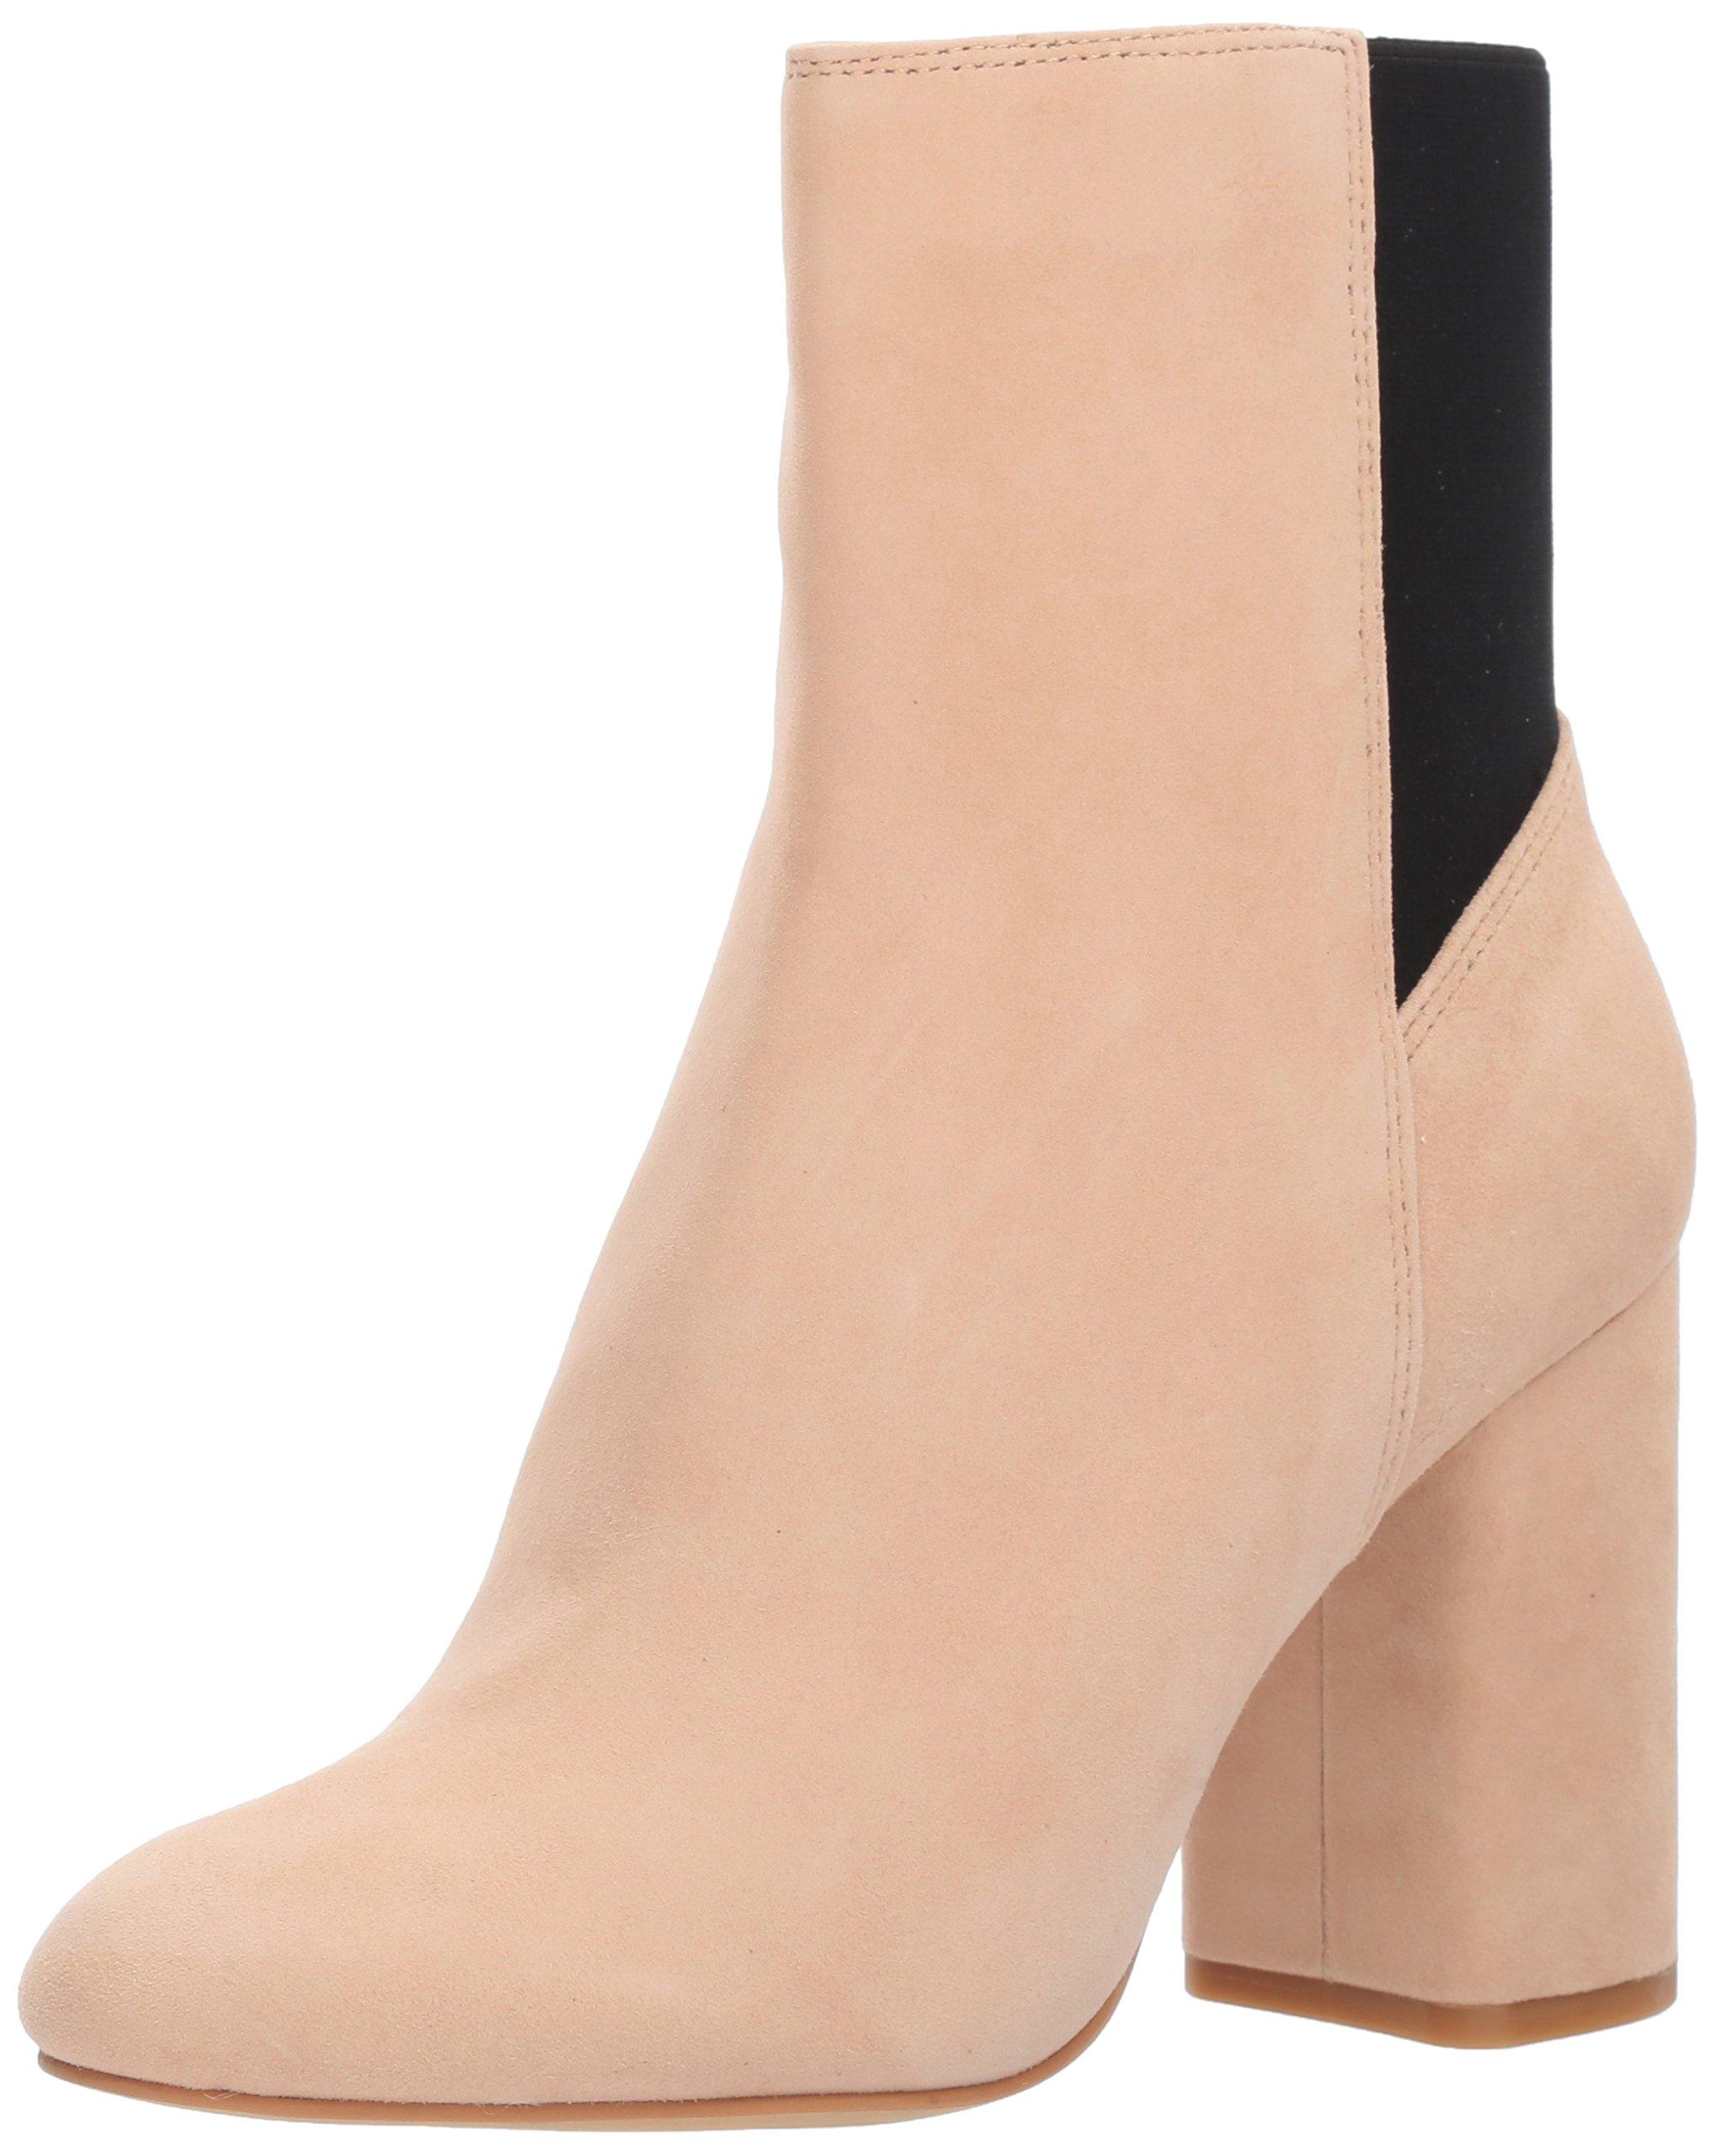 Dolce Vita Women's Ramona Fashion Boot, Blush Suede, 8 Medium US